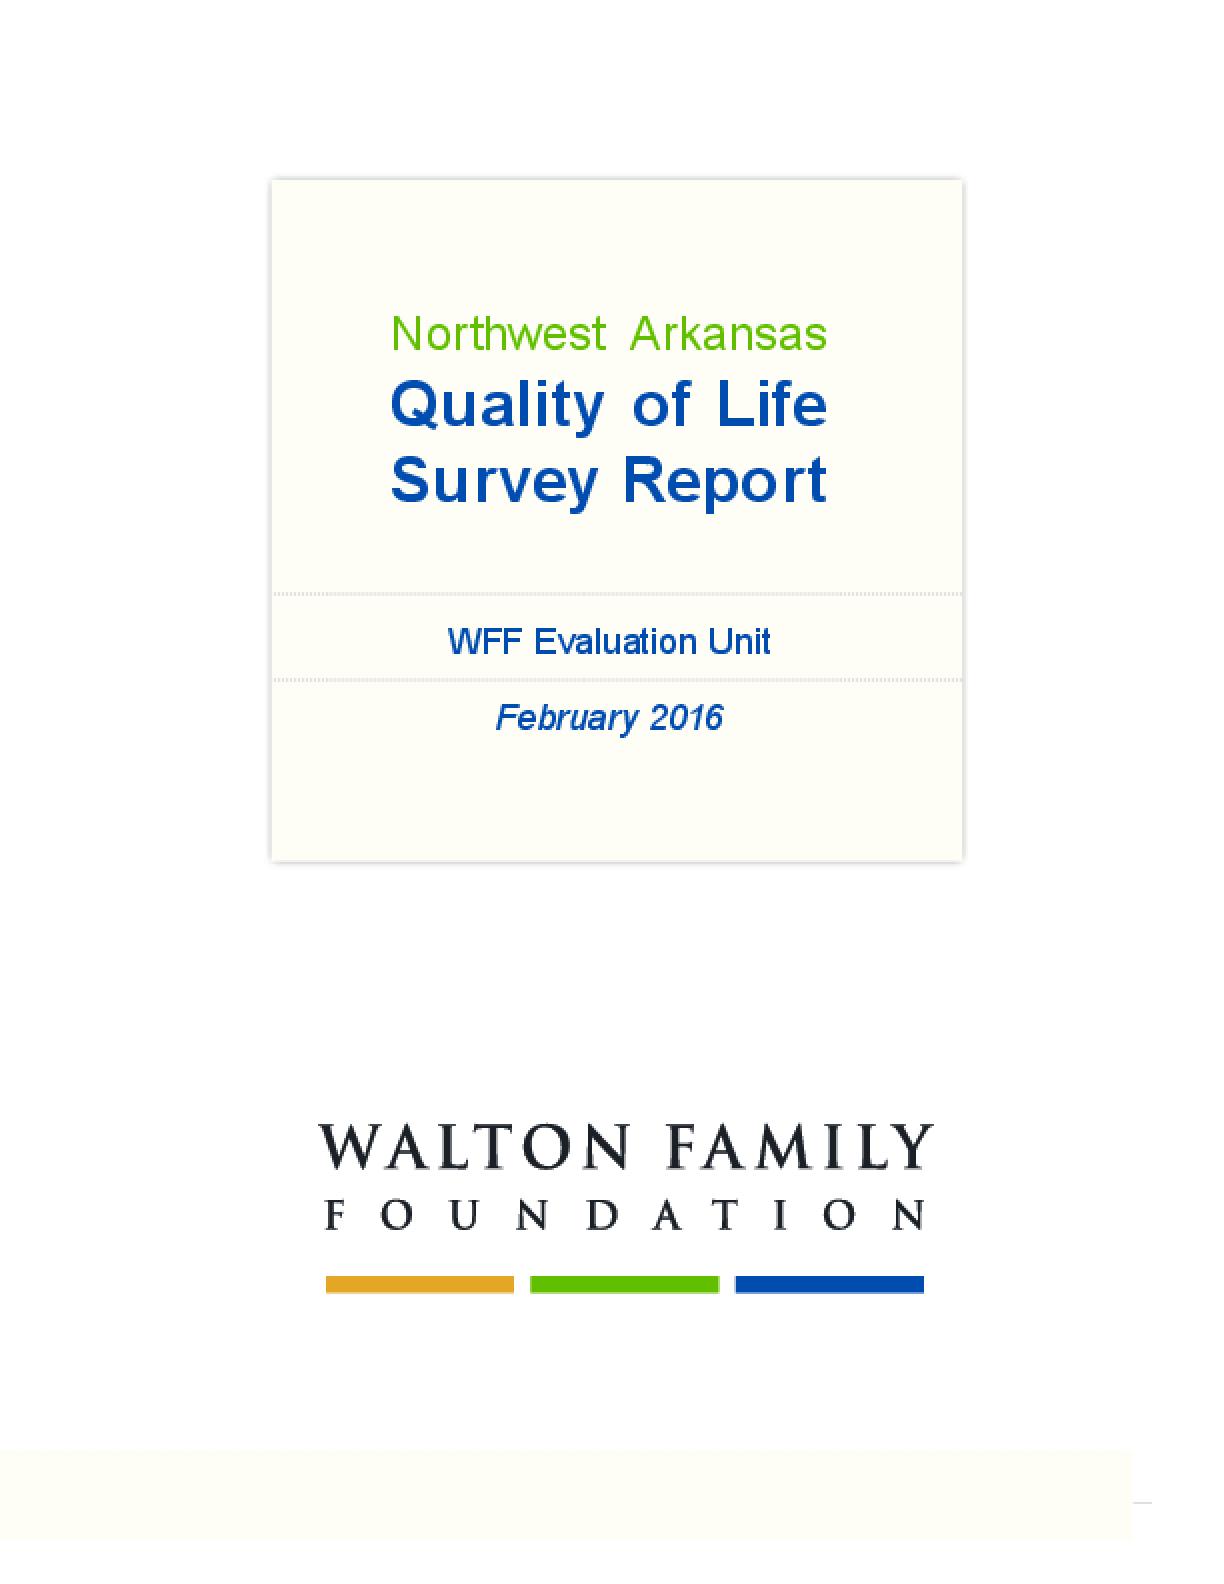 Northwest Arkansas Quality of Life Survey Report